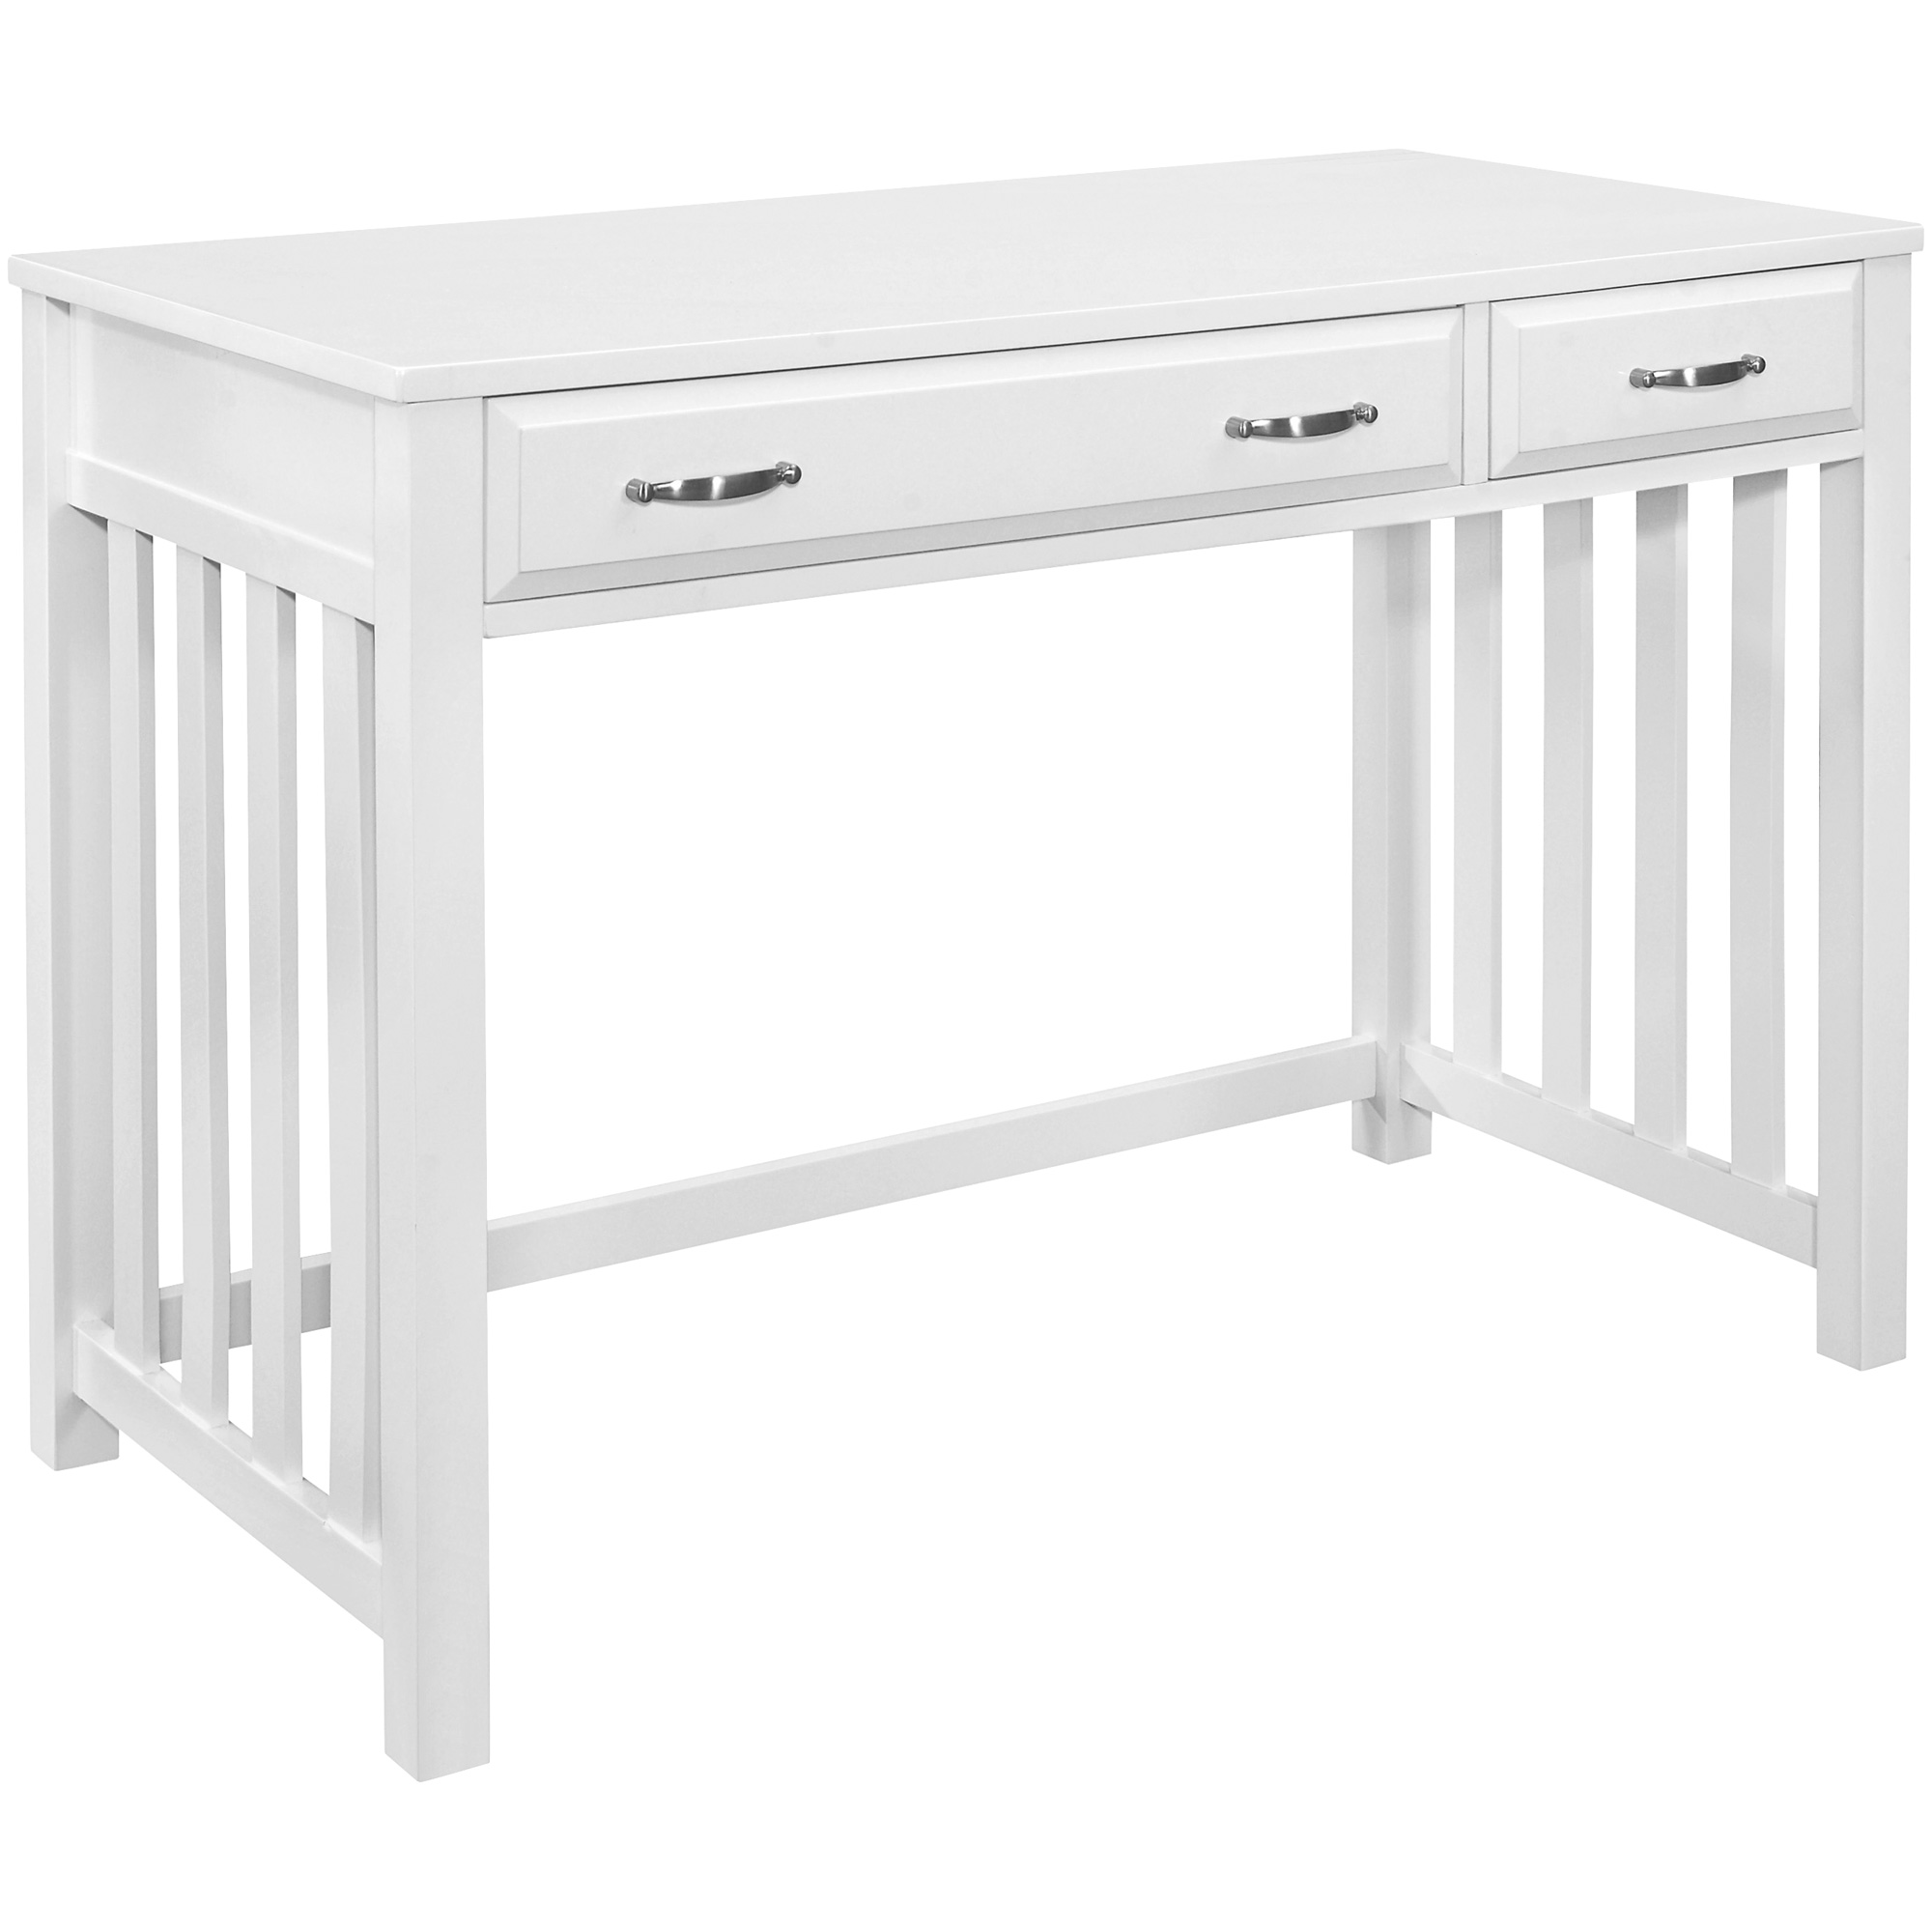 Top Line | Blanche White 2 Drawer Desk